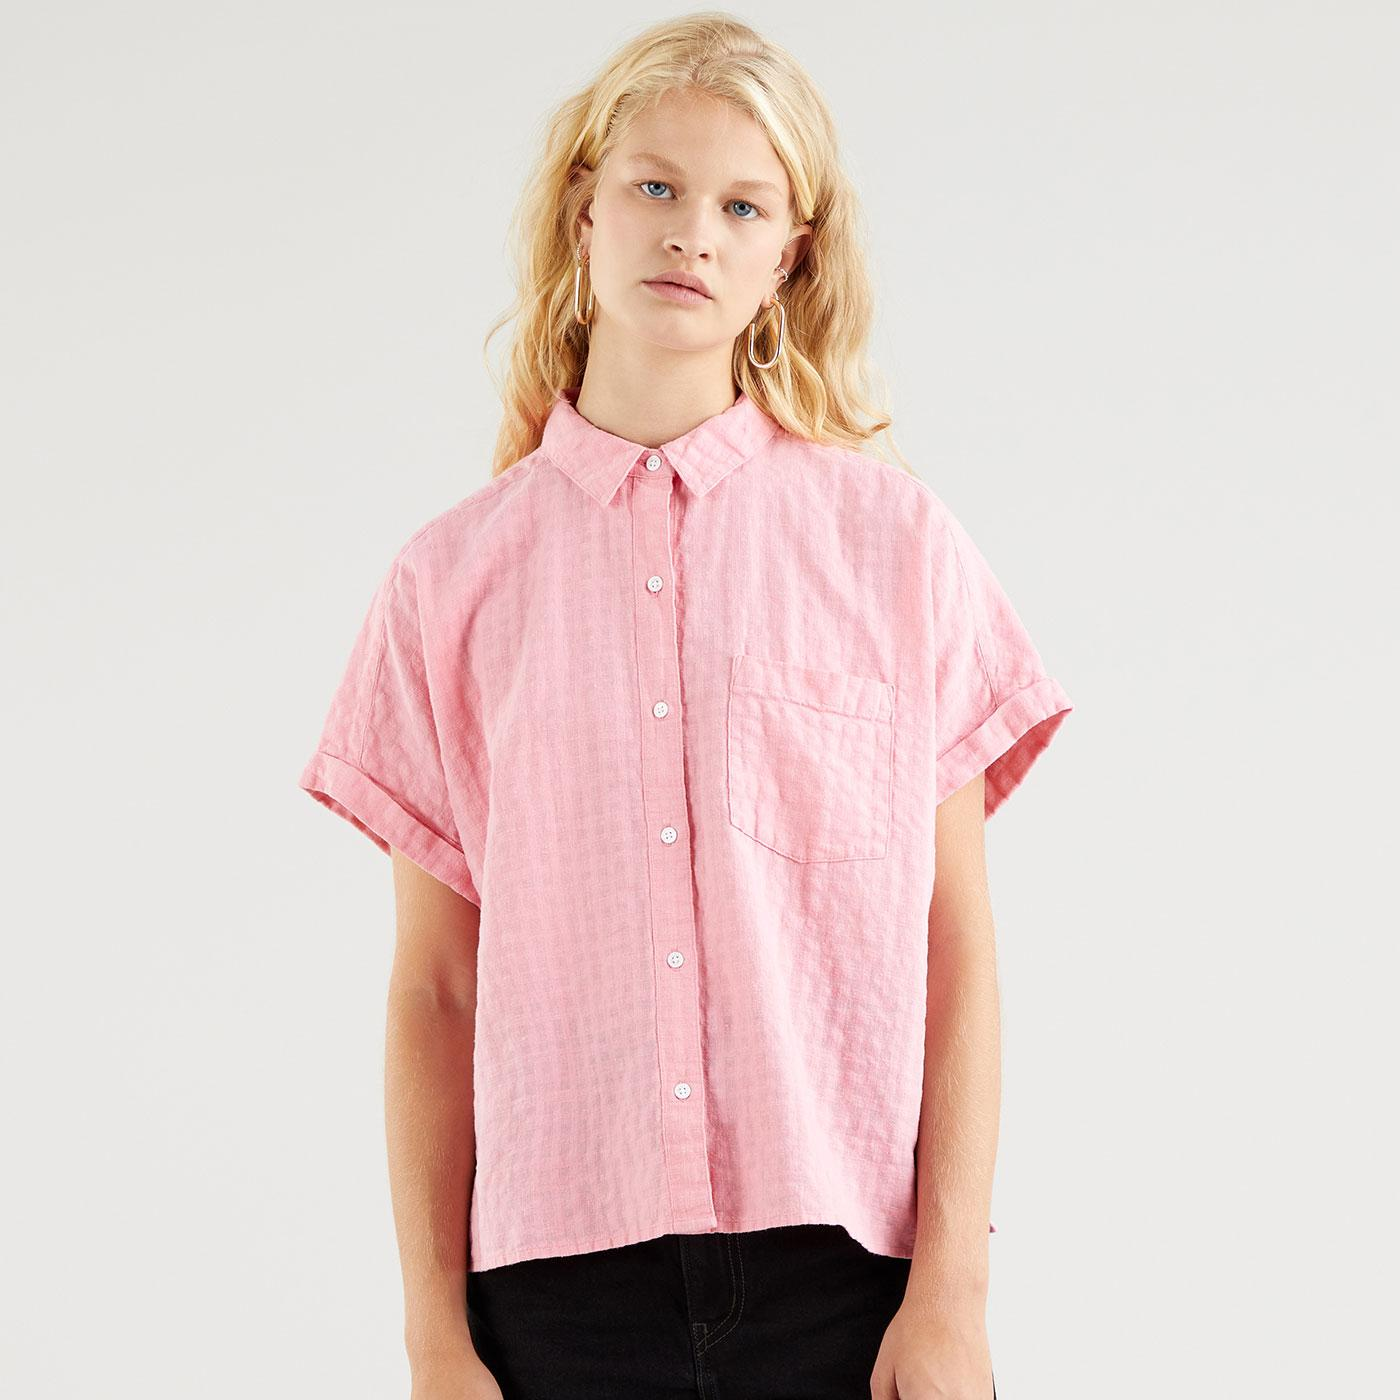 Laney LEVI'S WOMENS Retro Oversized Linen Shirt